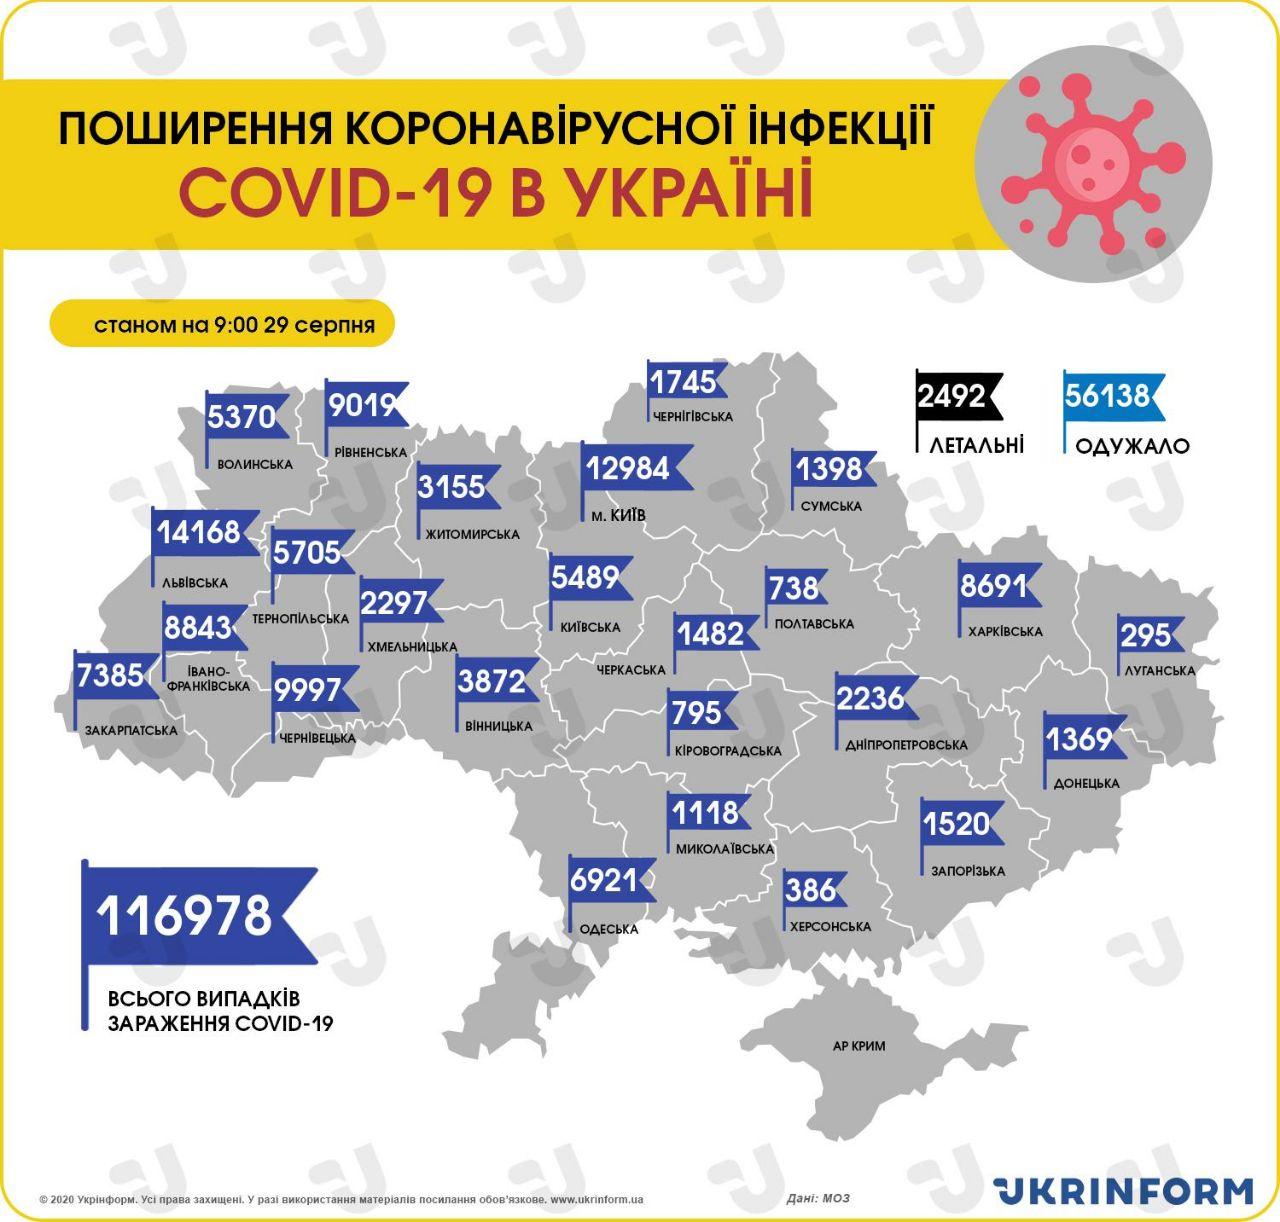 https://static.ukrinform.com/photos/2020_08/1598685949-542.jpg